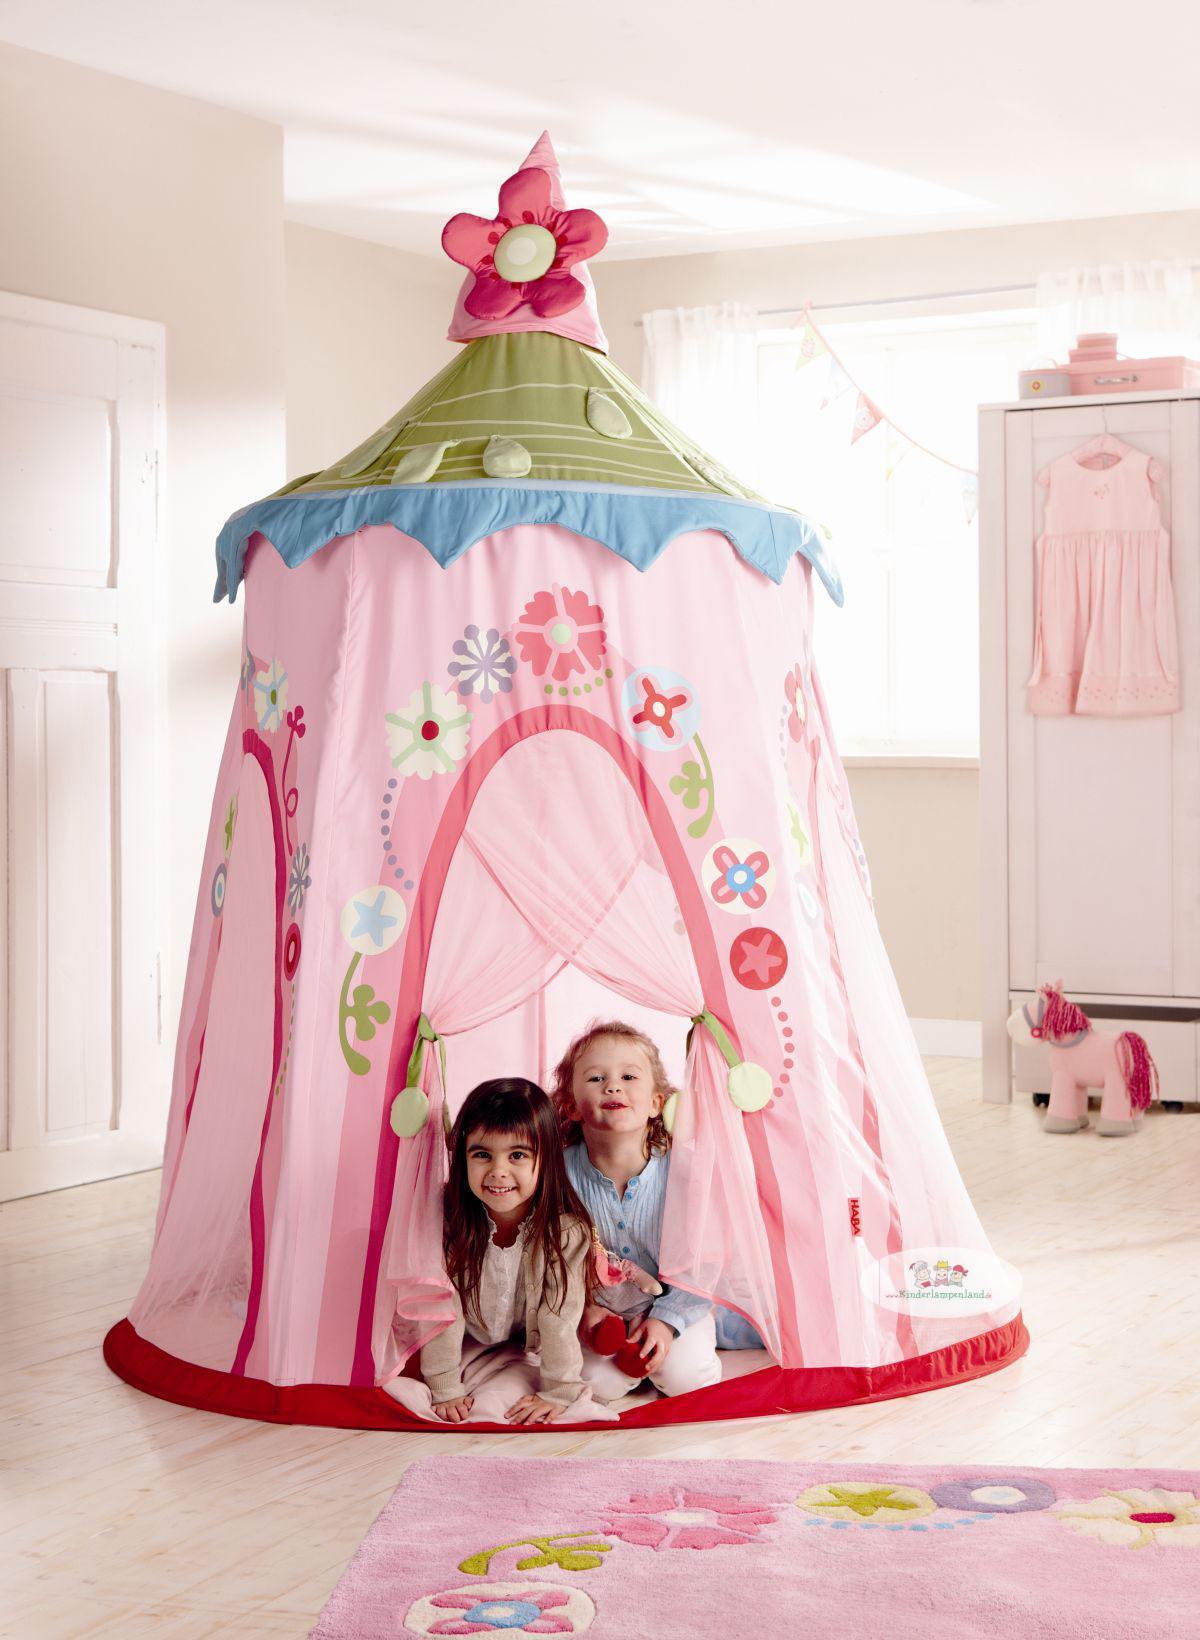 haba spielzelt blumenkranz rosa gr n spielzelte schaukeln im kinderlampenland. Black Bedroom Furniture Sets. Home Design Ideas